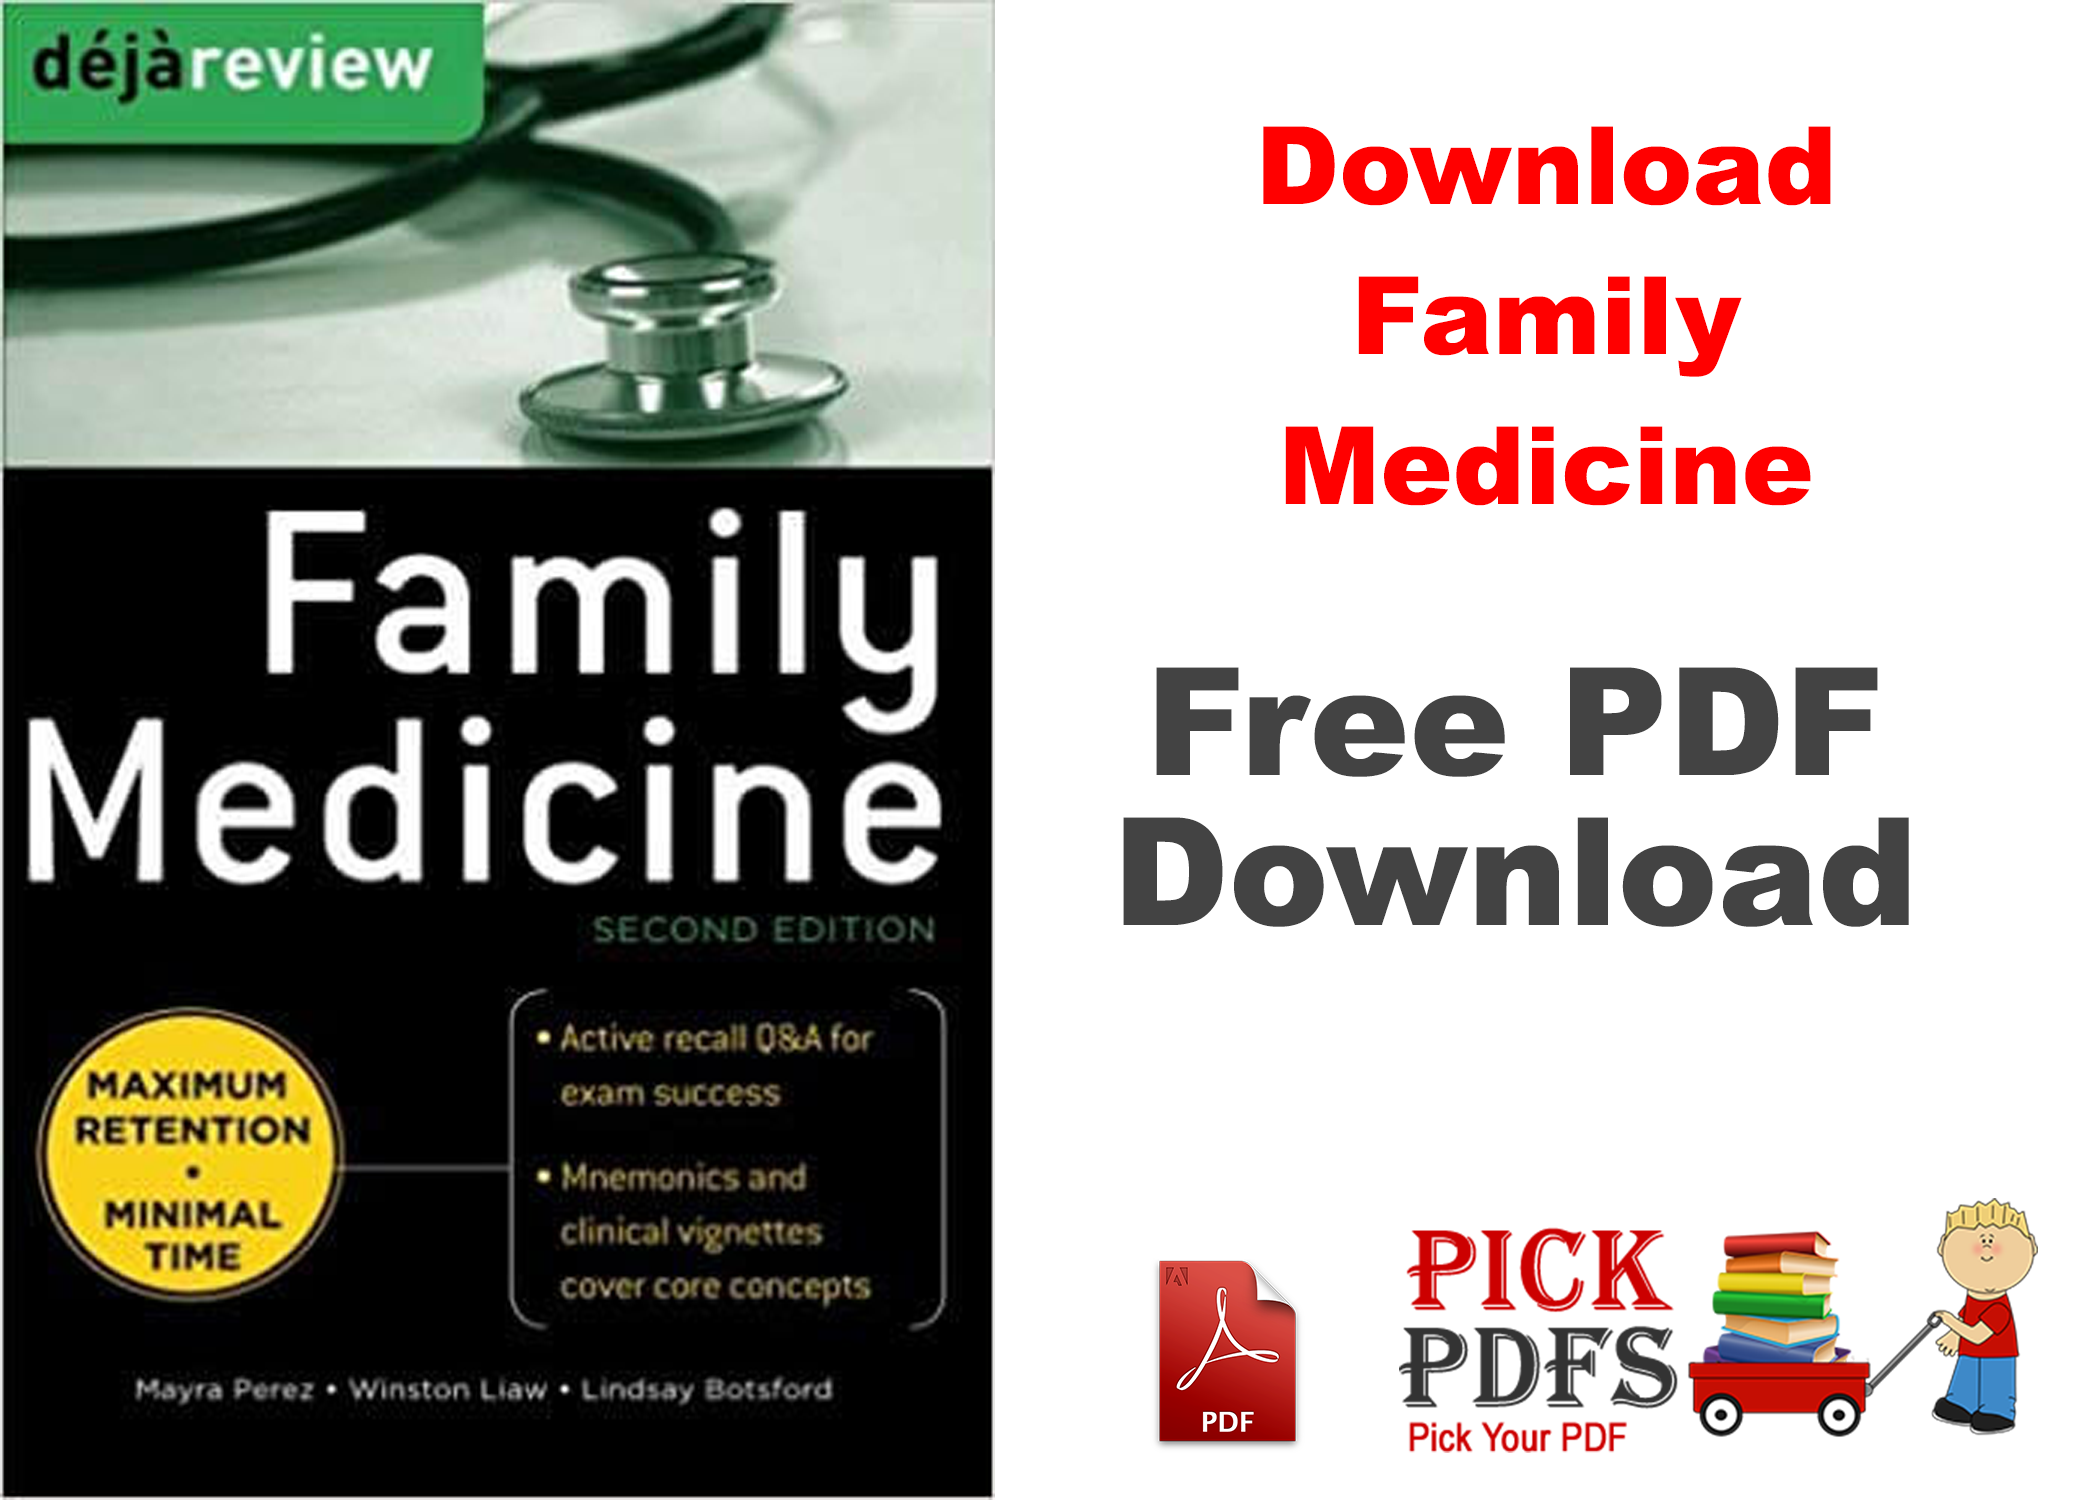 https://pickpdfs.com/thieme-test-prep-for-the-usmle-pathology-qa-pdf-direct-link/